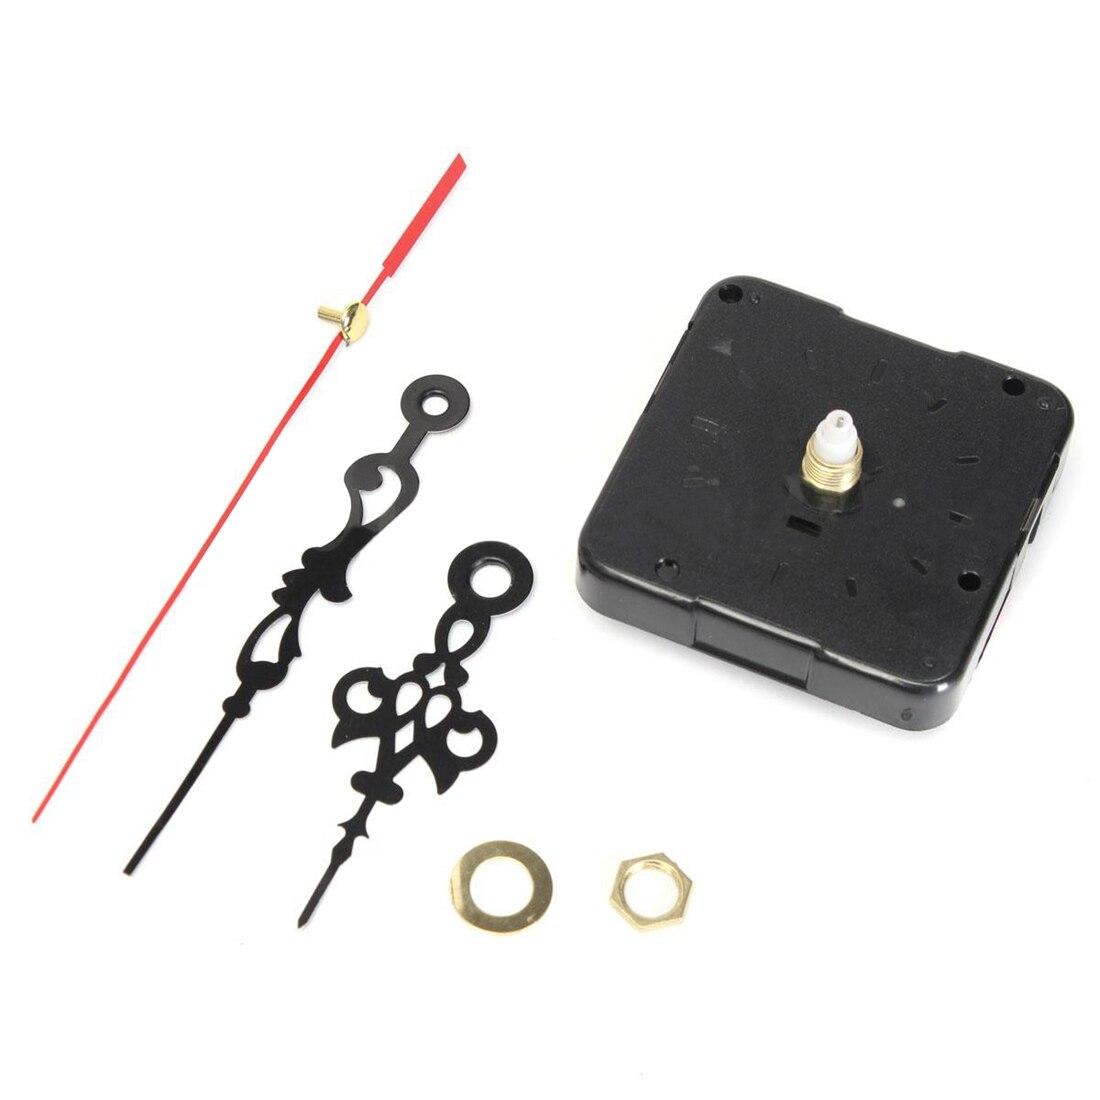 YCYS-Quartz Clock Movement Mechanism Module Repair DIY Kit Battery Powered With Hands